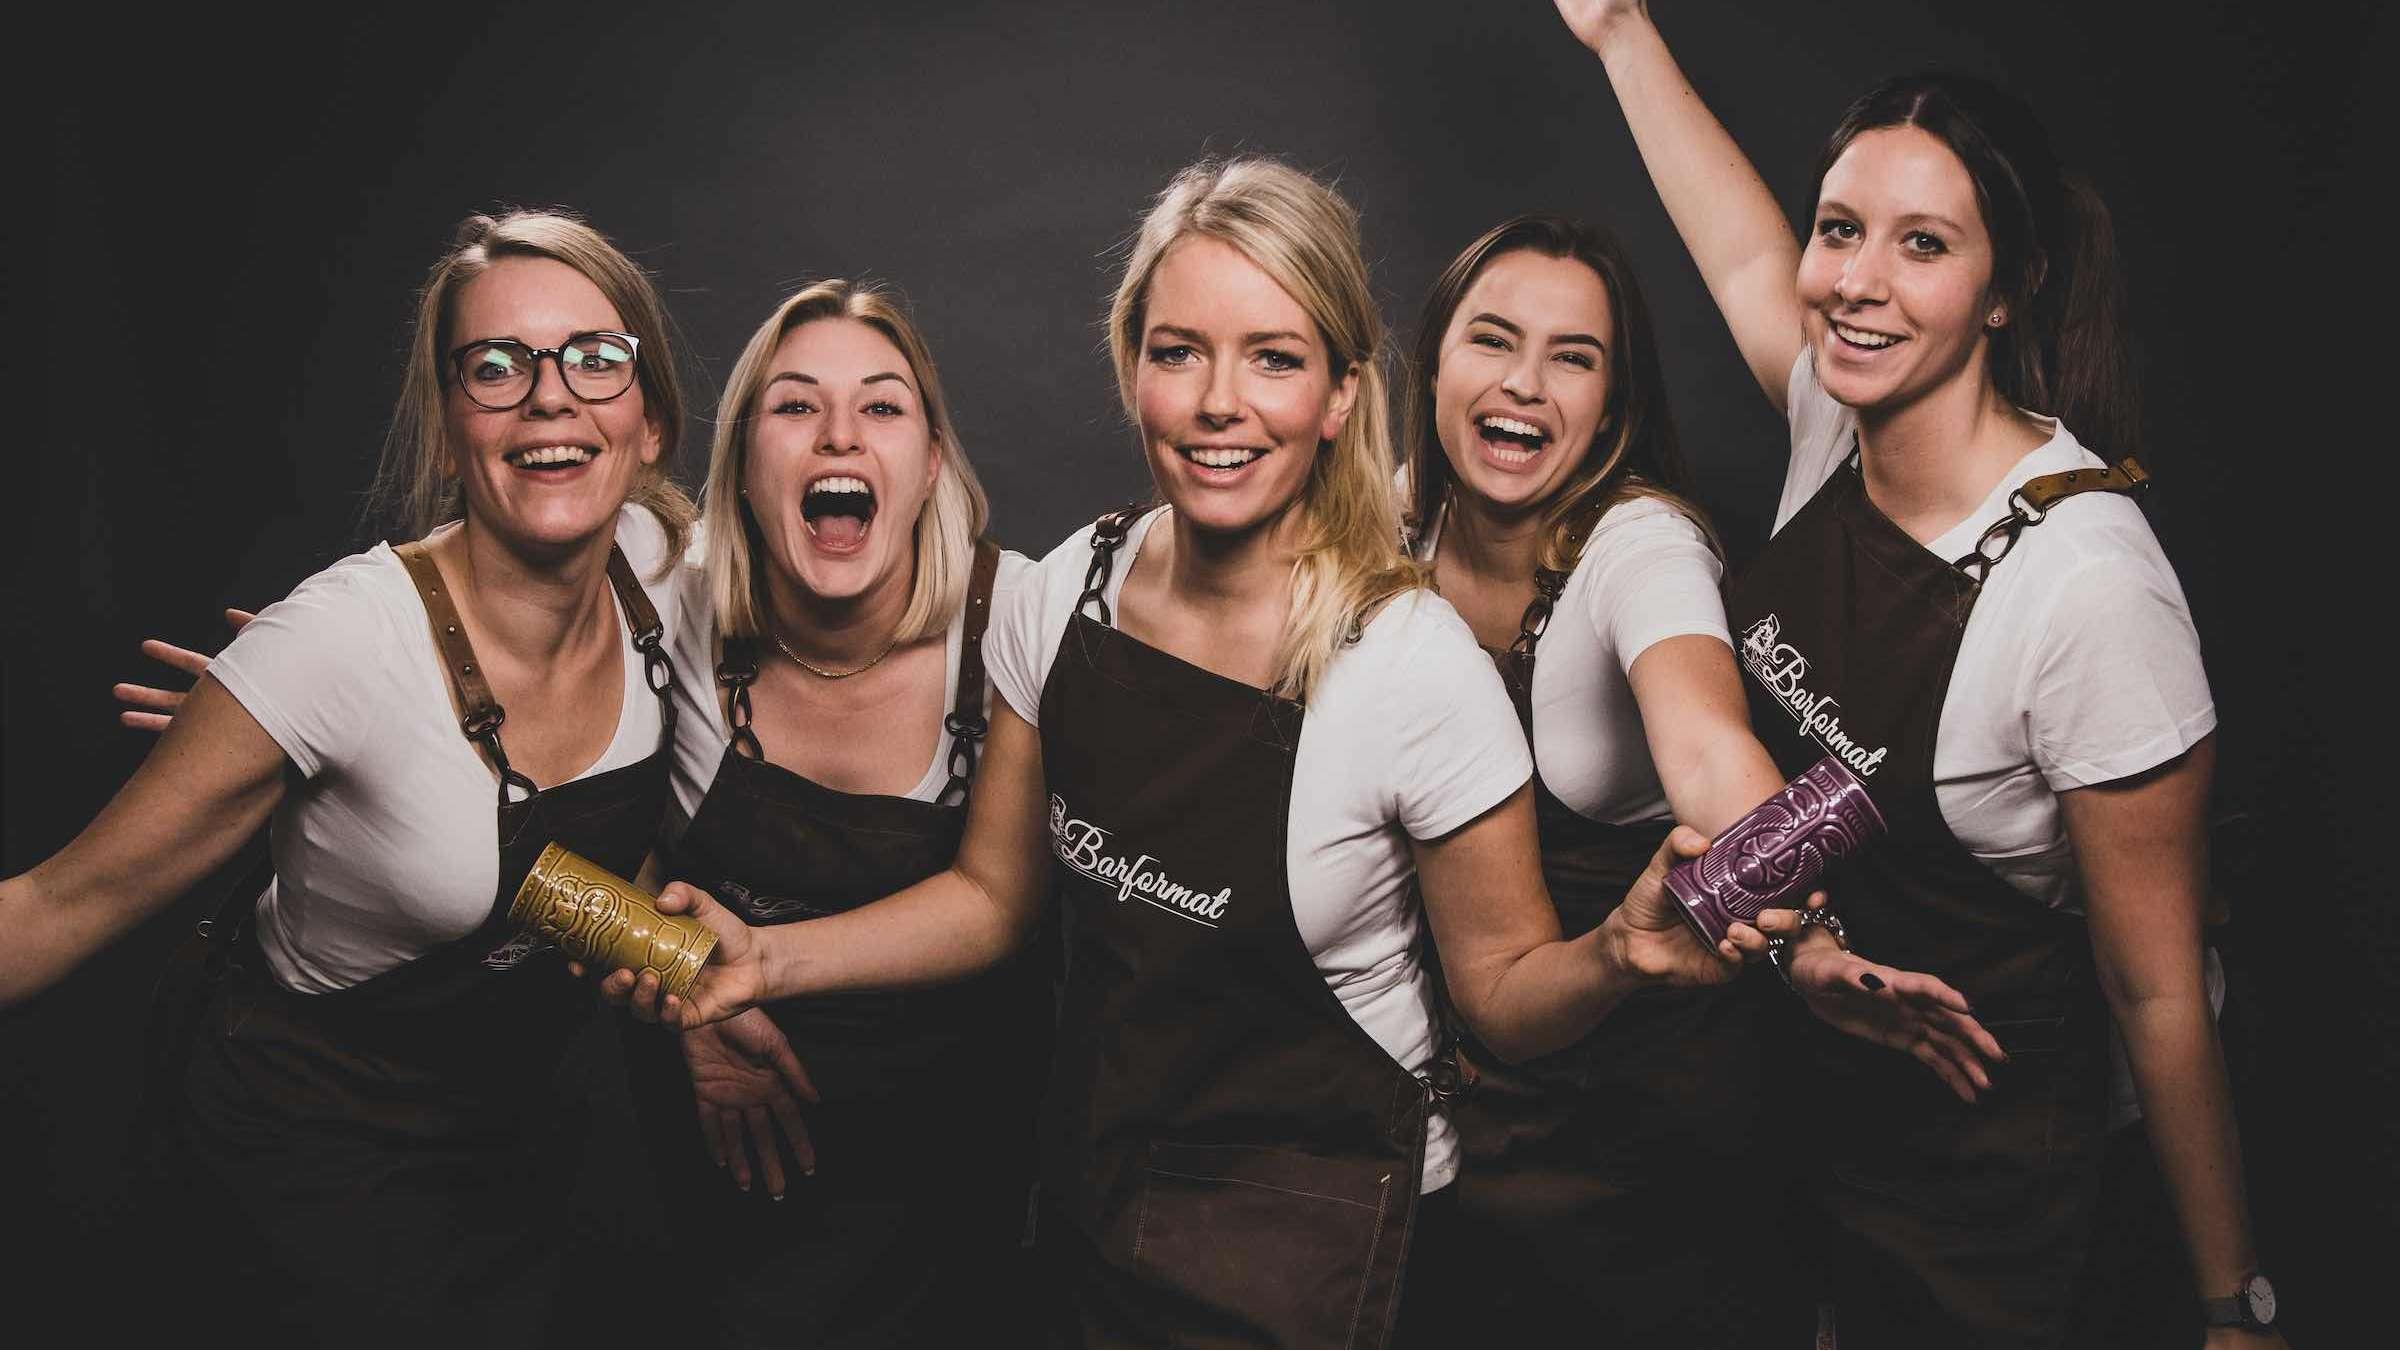 Lehmann |Eventservice |Hannover |Partner |Barformat |Mobile |Bar |Cocktailservice |Weinbar |Ginbar |Tasting |Foodtruck |Bulli |Bar |Ginbar |Weinbar |Kaffee |Bulli |Bar |Barkeeper |Mieten |Buchen